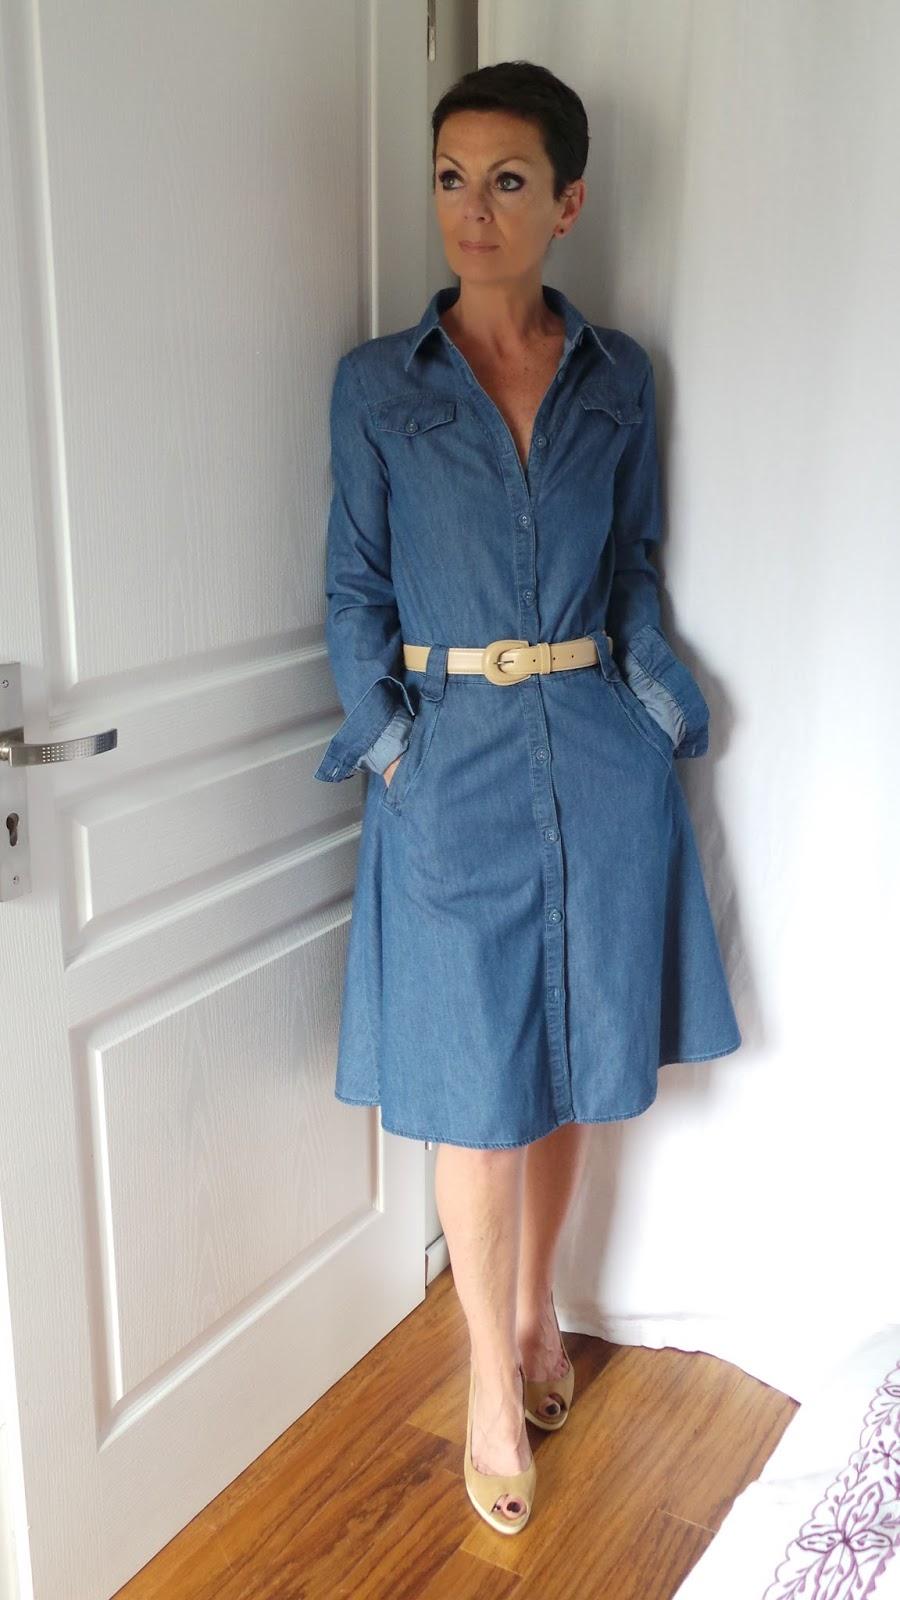 moduxe la robe en jean vas e. Black Bedroom Furniture Sets. Home Design Ideas